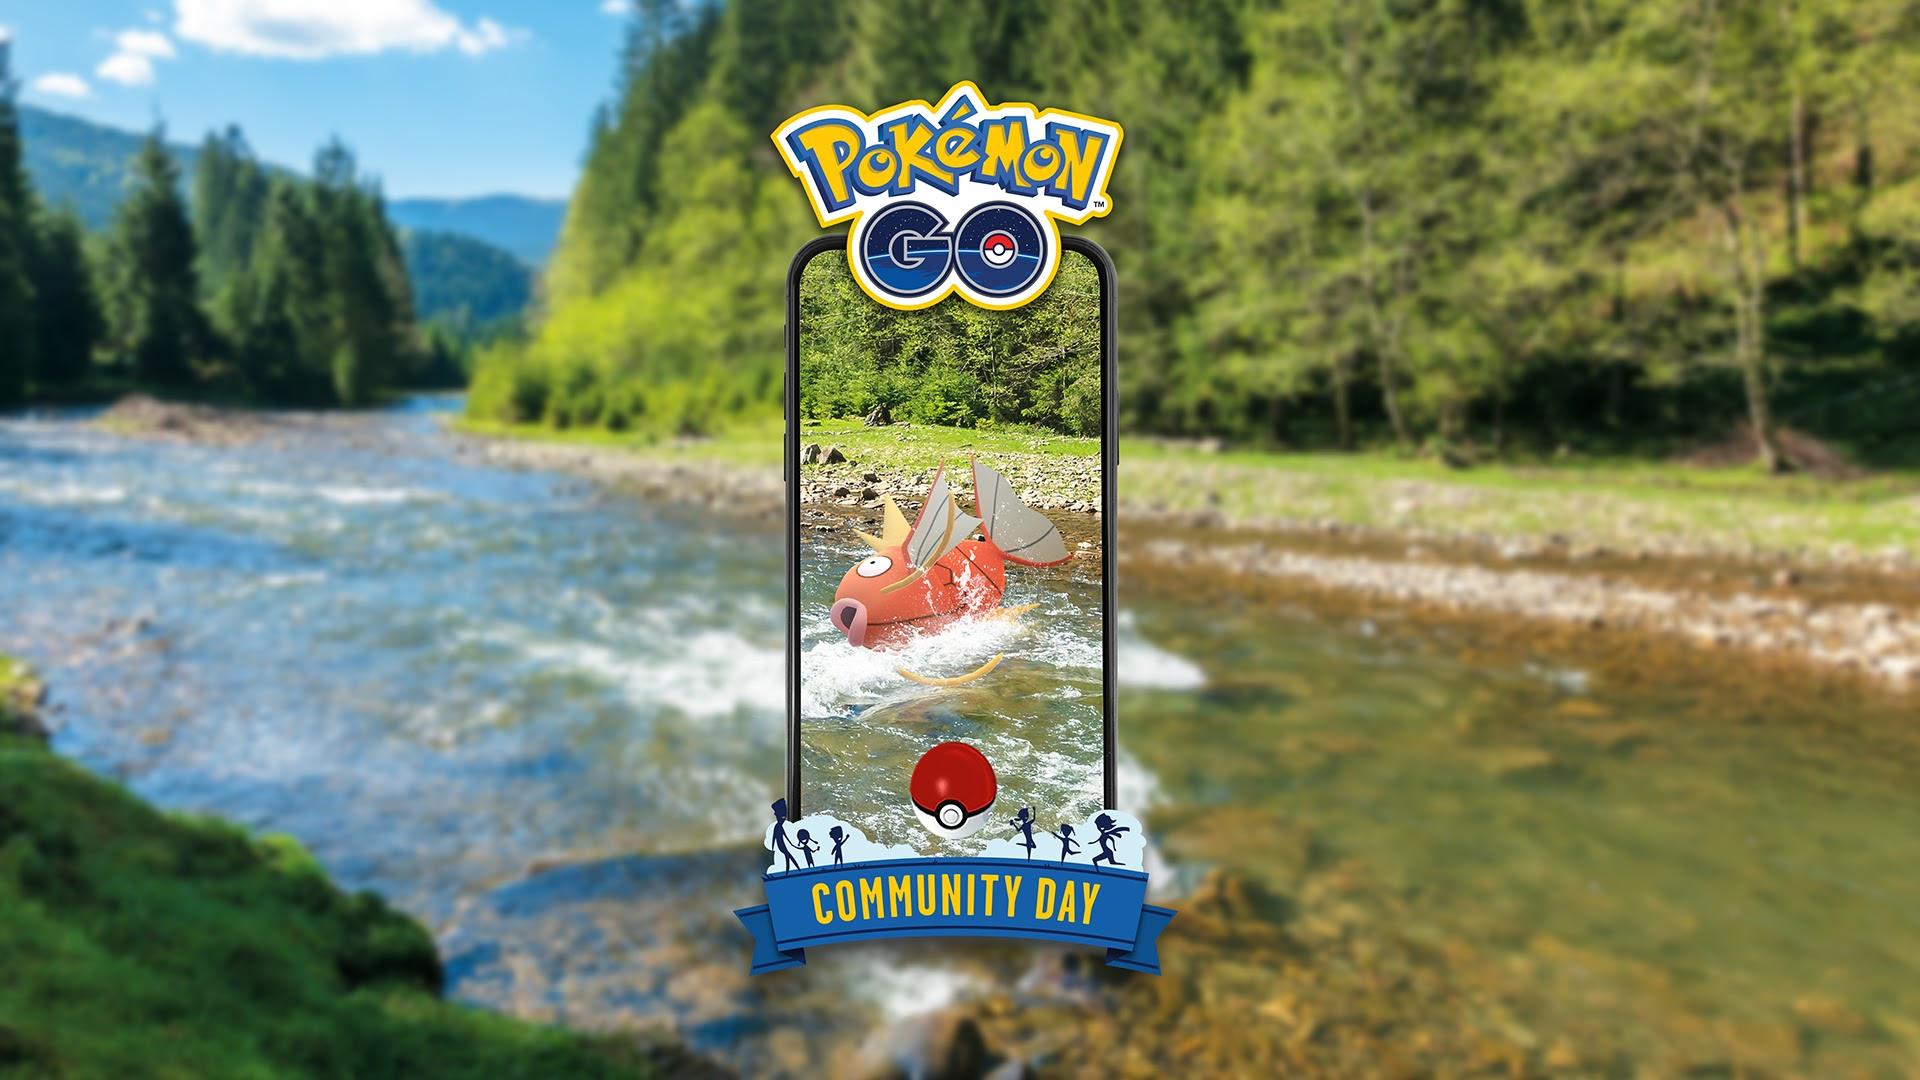 Pokemon Go 鯉魚王社群日 Magikarp Community Day